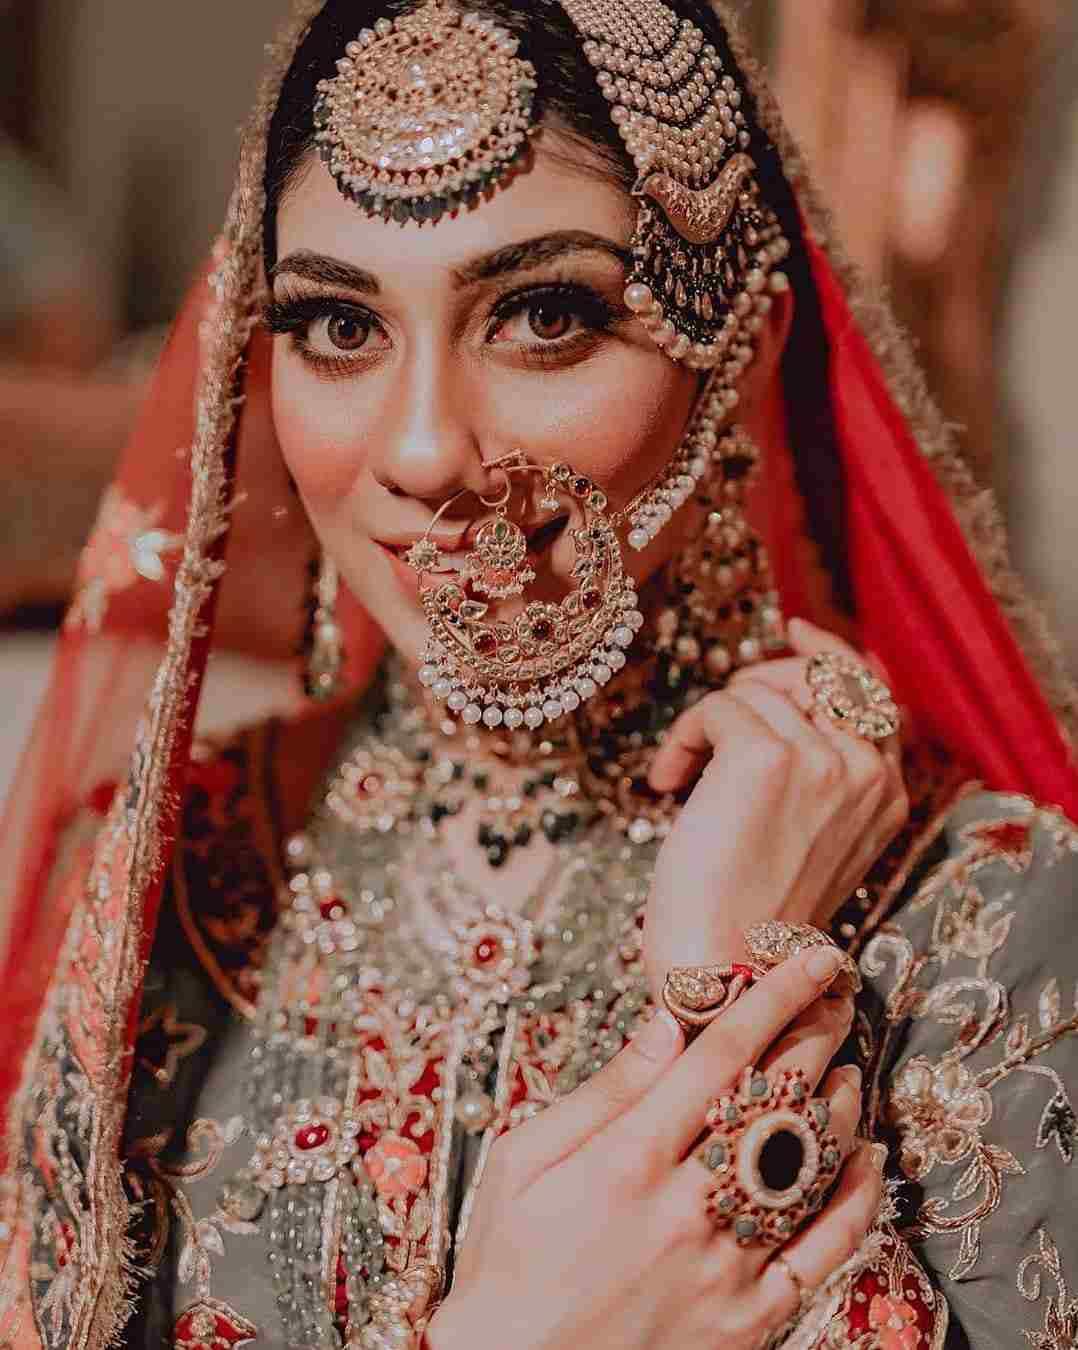 Bridal Portrait | bridal makeover | bridal nath | bridal naath | bridal jewelry | bridal makeup | bridal outfit